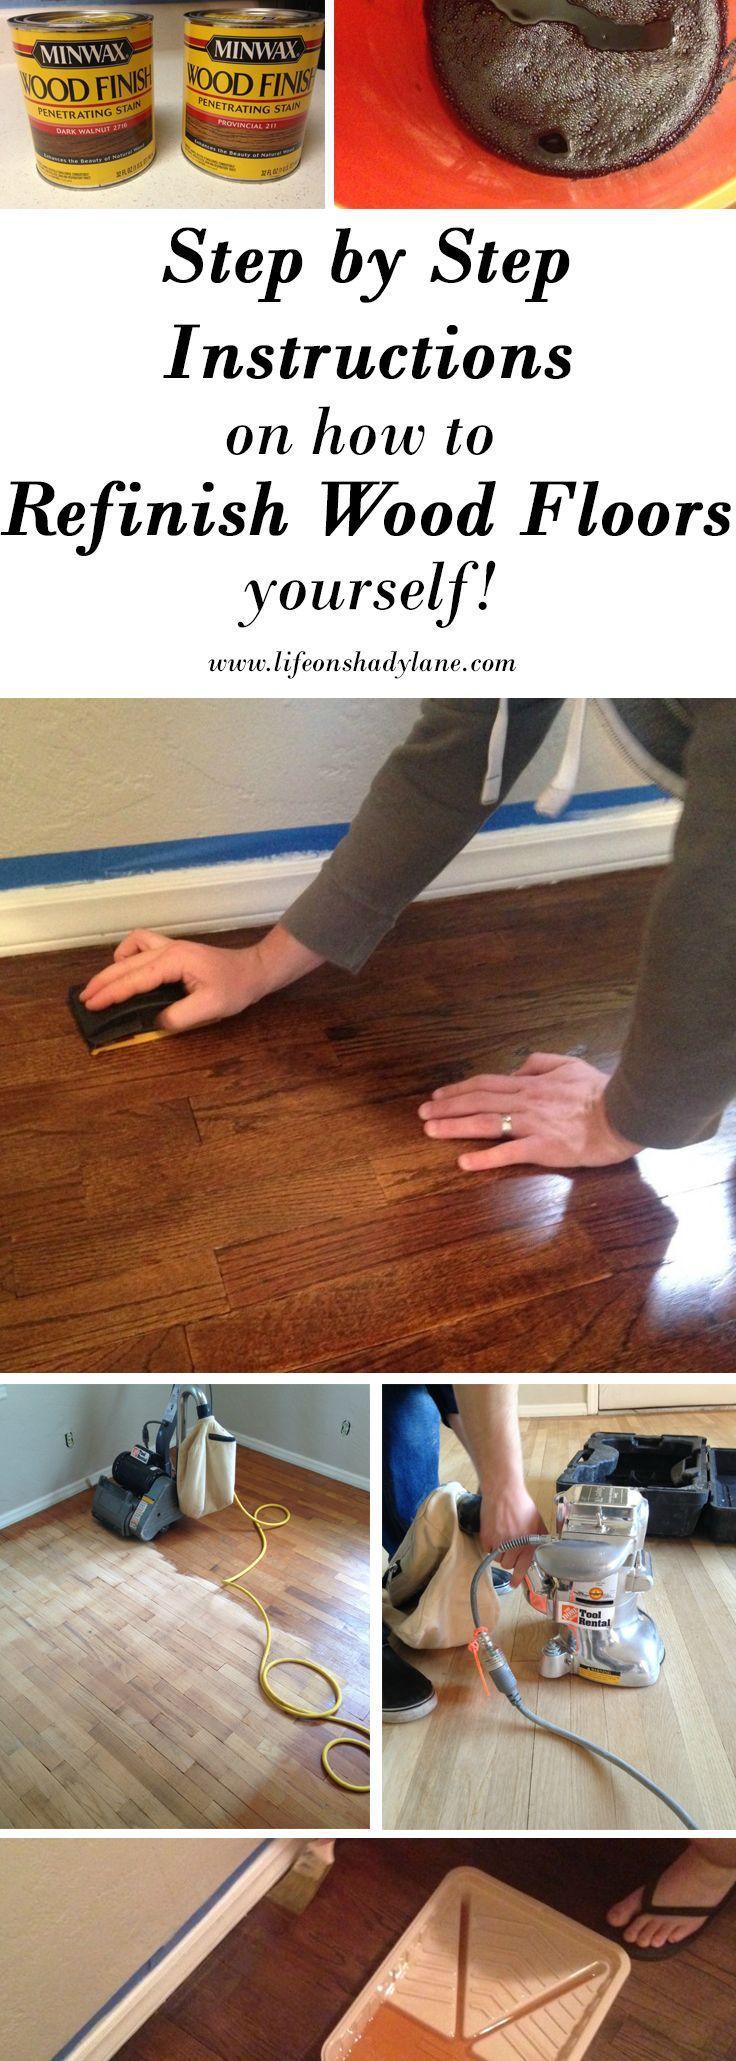 how to refinish hardwood floors cost of luxury of diy wood floor refinishing collection intended for diy wood floor refinishing fresh how to refinish hardwood floors part 1